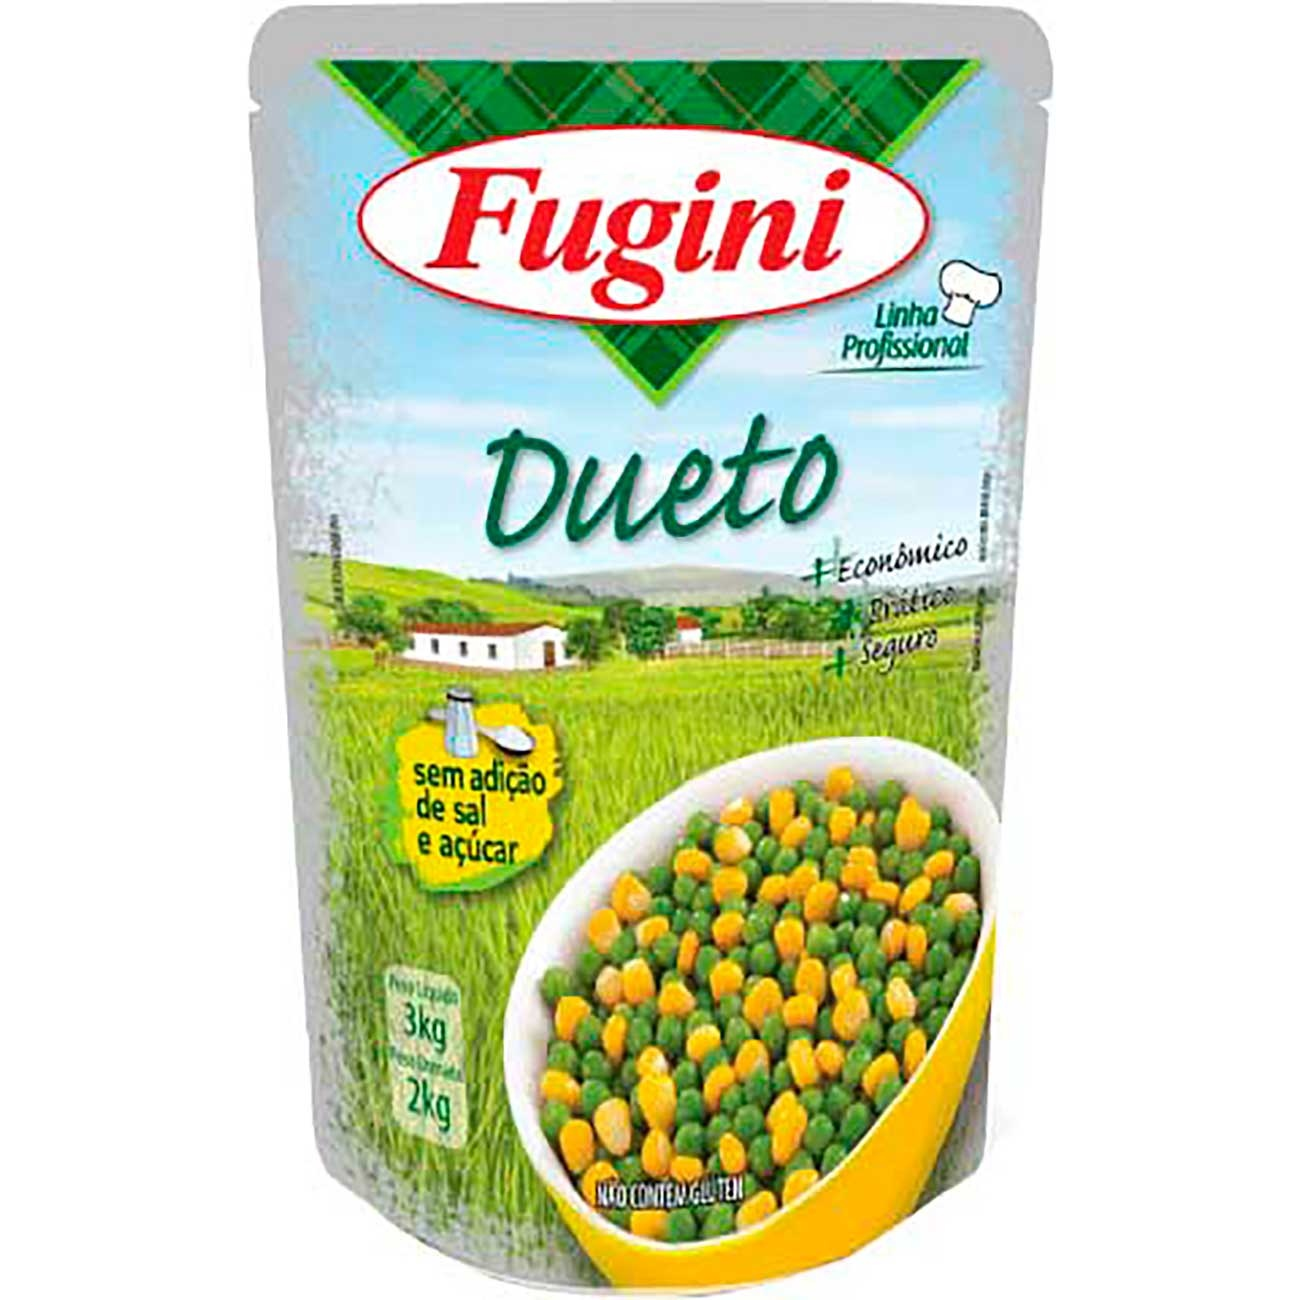 Dueto Fugini Ervilha/Milho Sach� 2kg